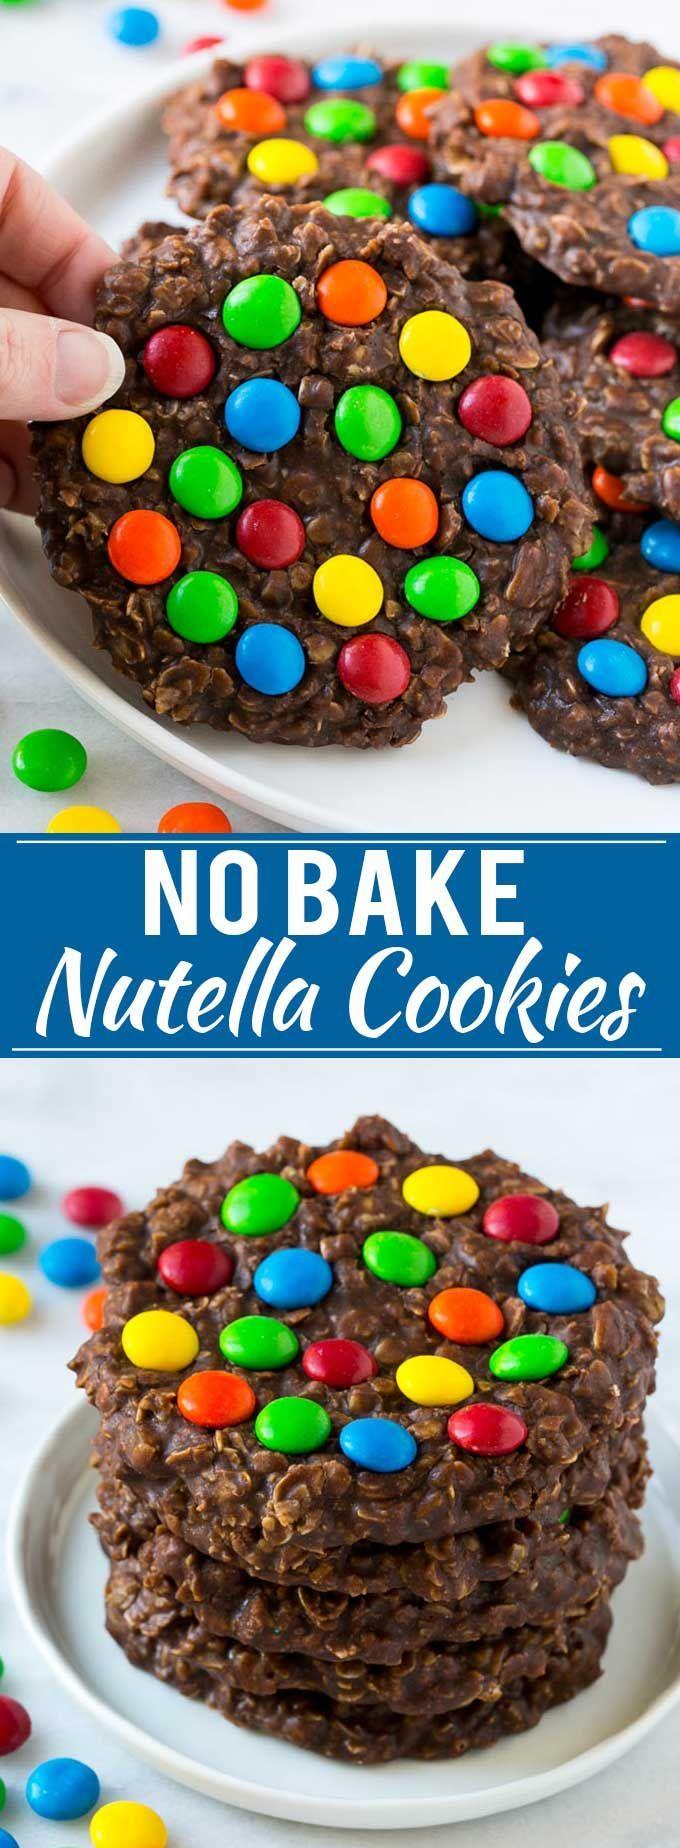 No Bake Nutella Cookies   No Bake Cookie Recipe   M&M's Cookies   Chocolate Oatmeal Cookies